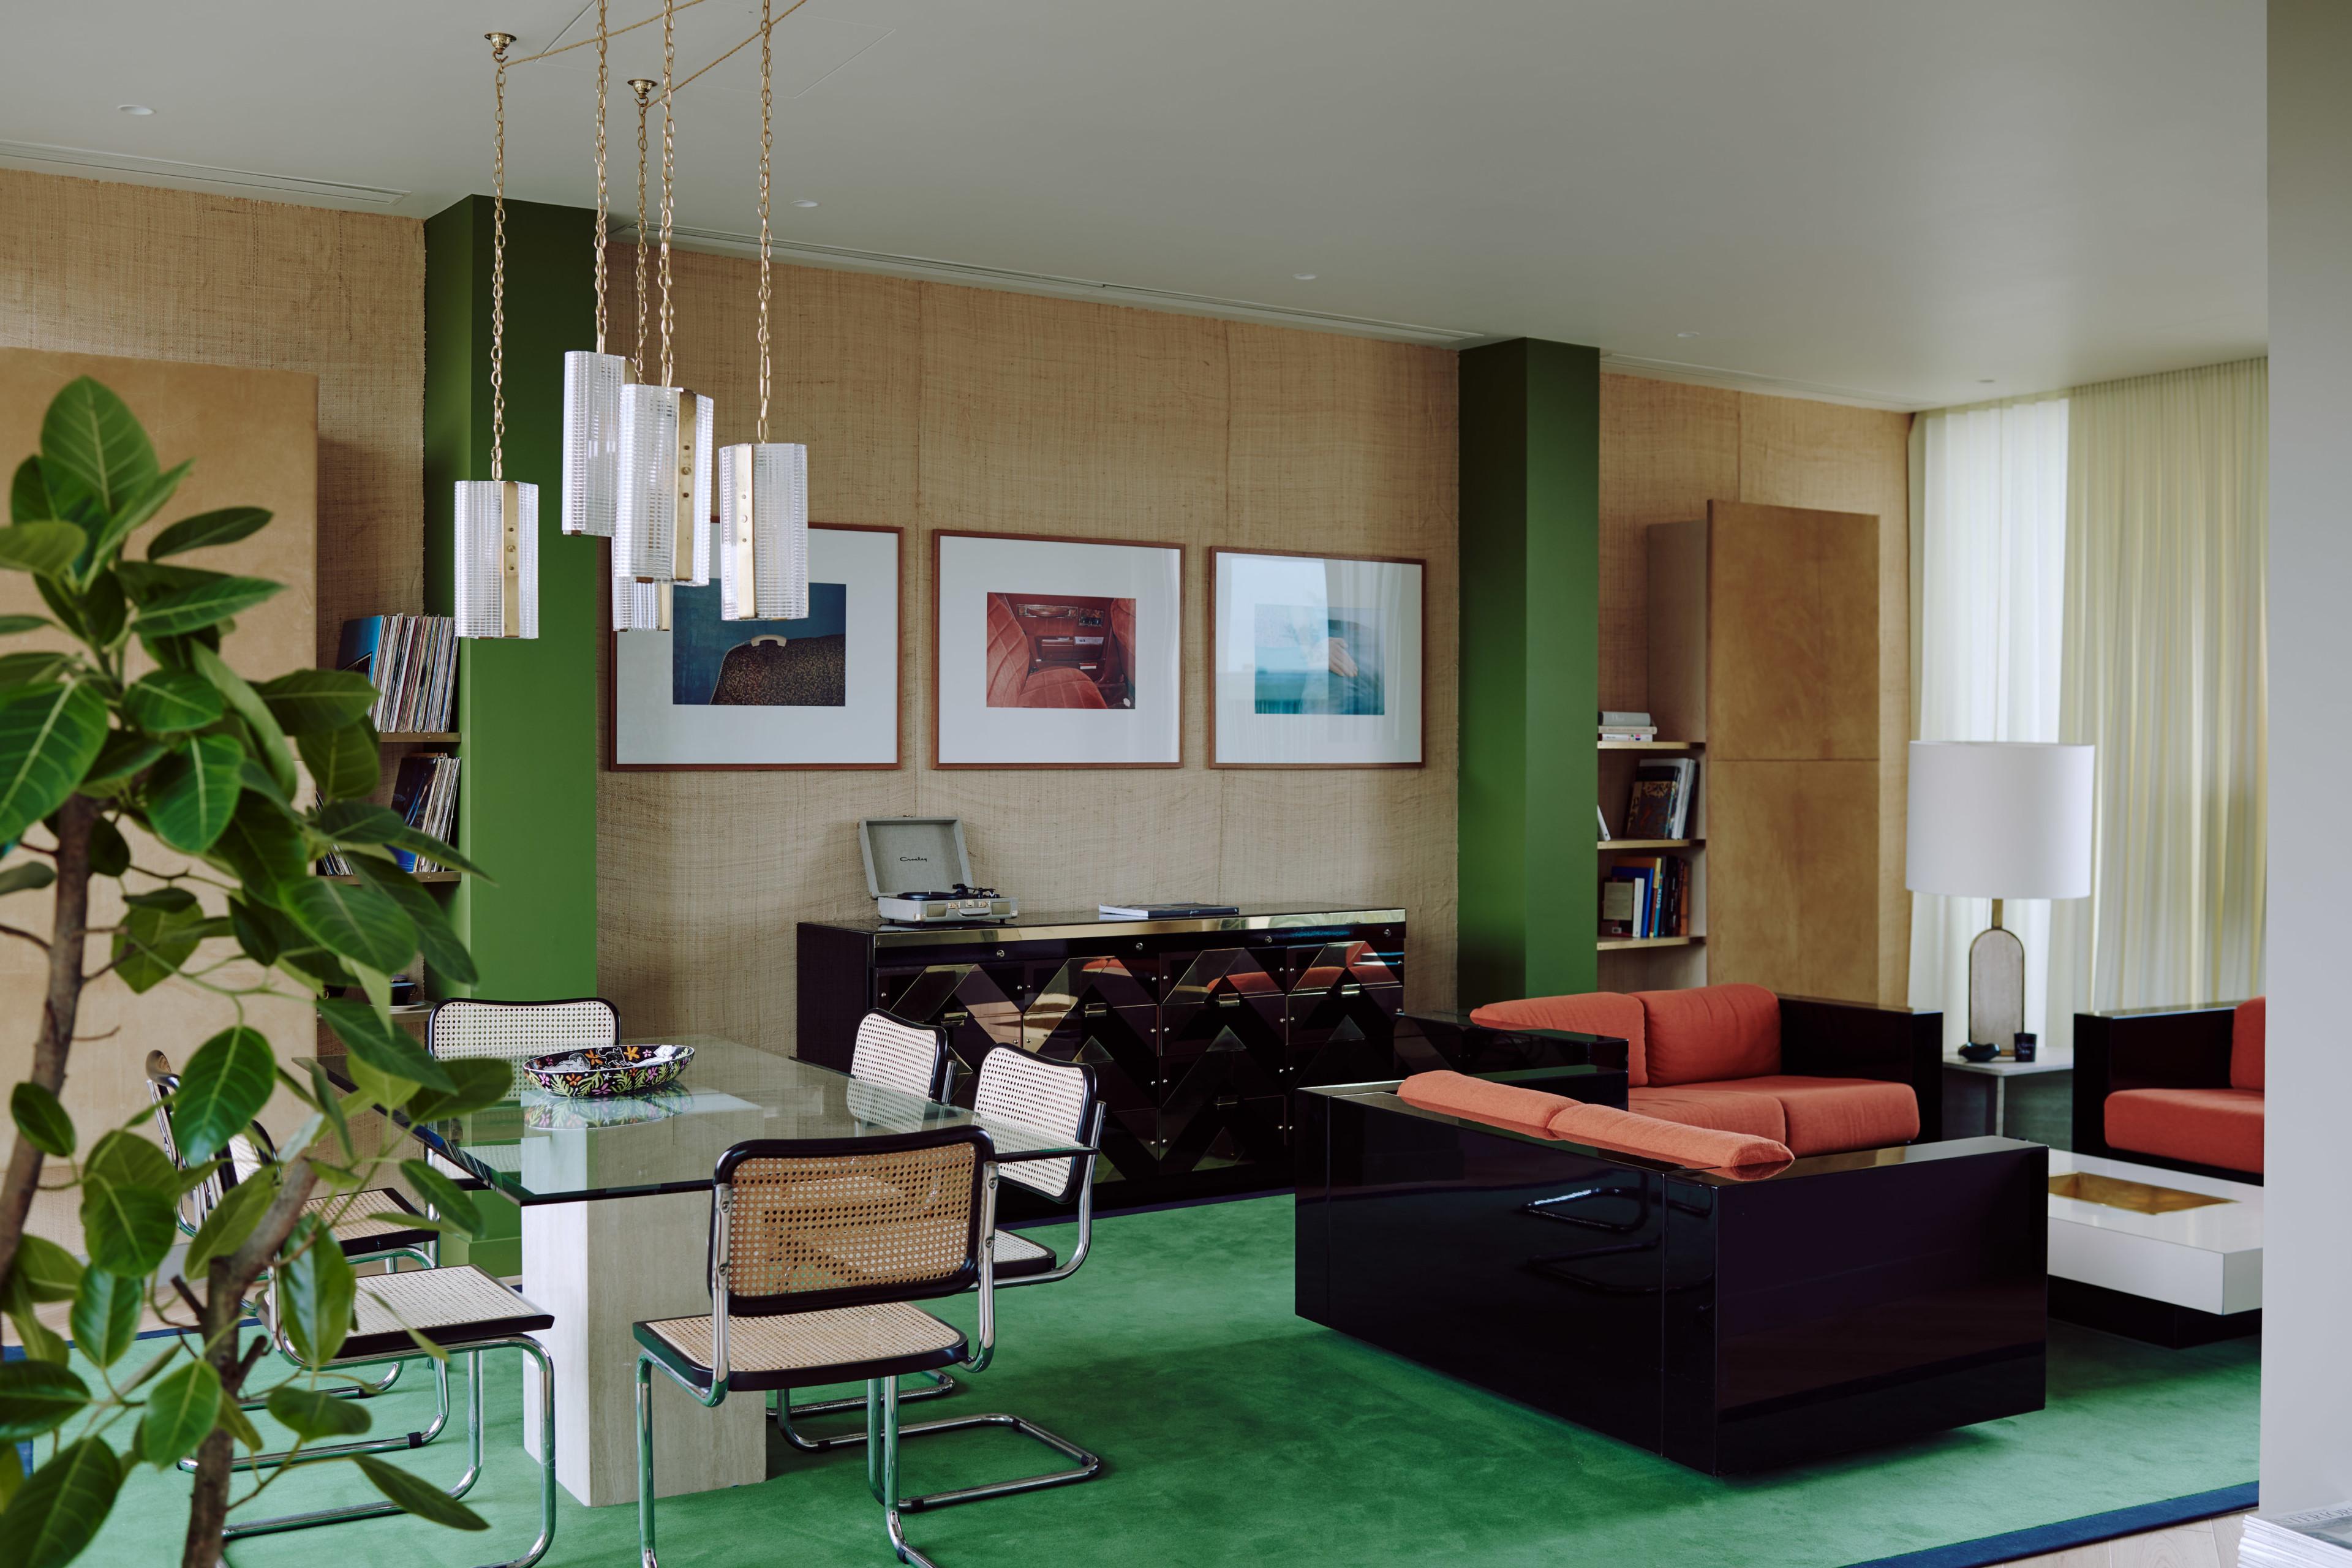 Bella Freud Apartment -Living Room-Retrouvius-Televison-centre-006-Web (5)-© Michael Sinclair